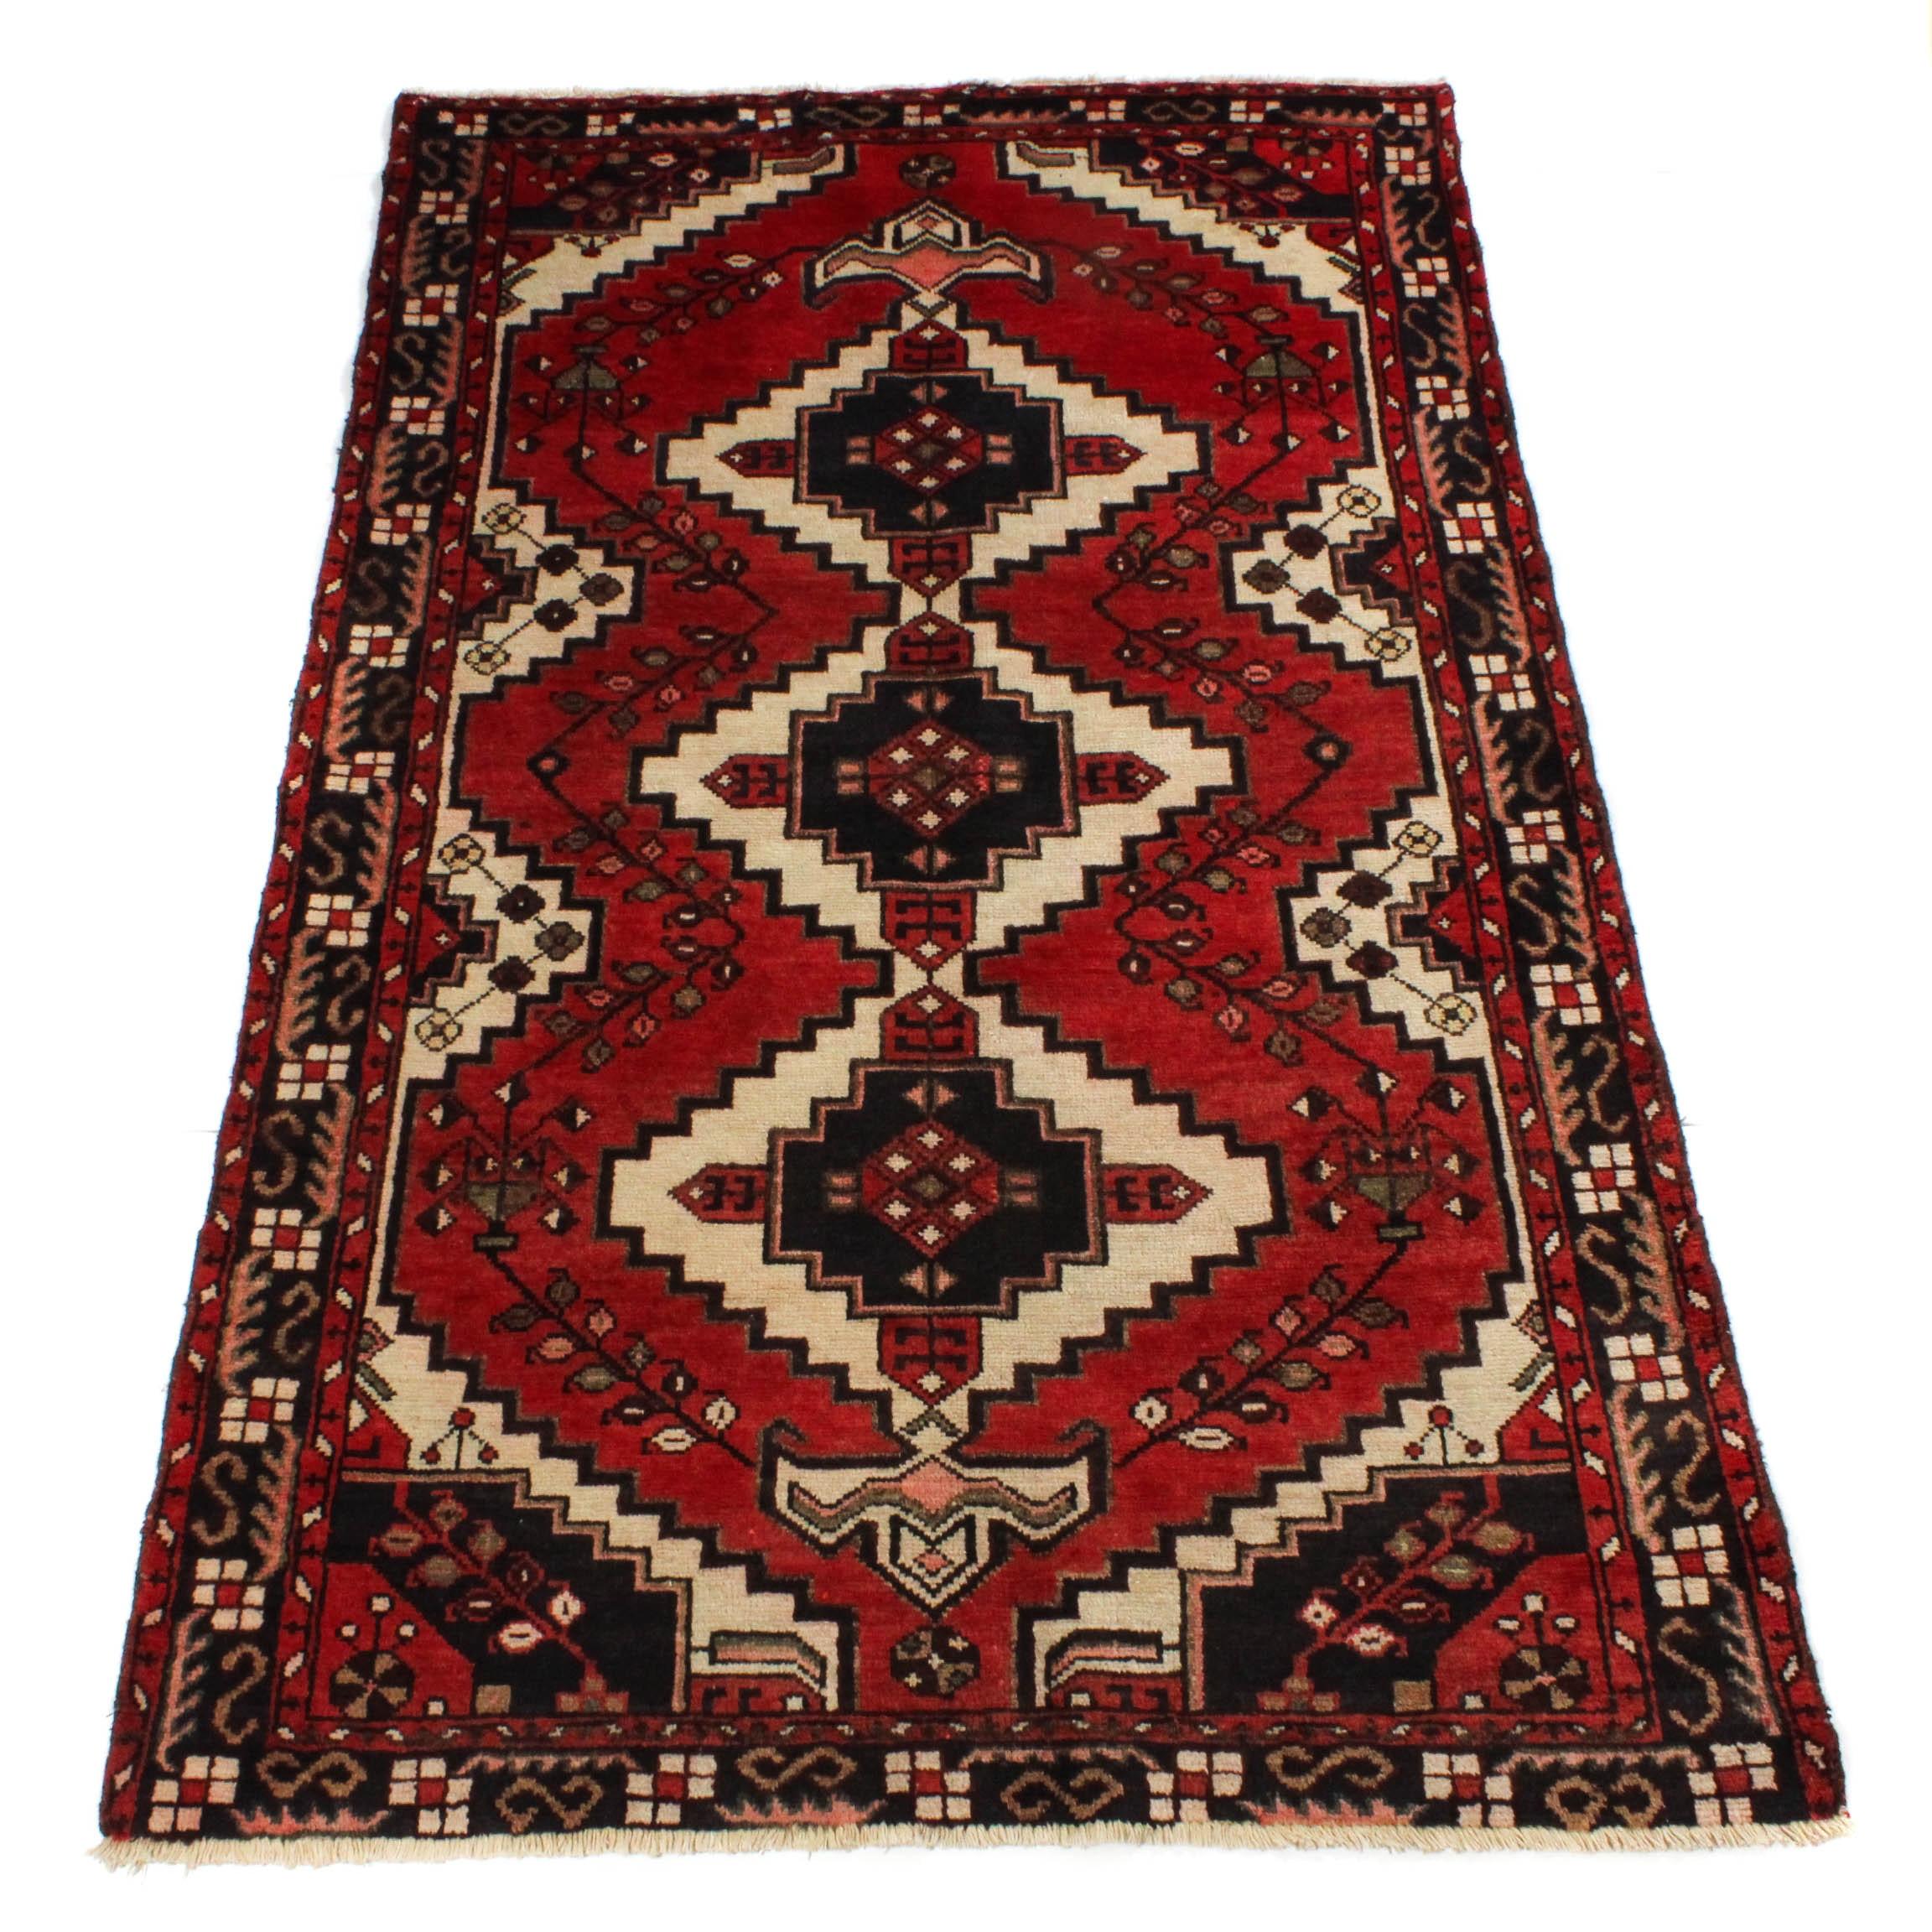 3'11 x 6'5 Semi-Antique Hand-Knotted Persian Zanjan Rug